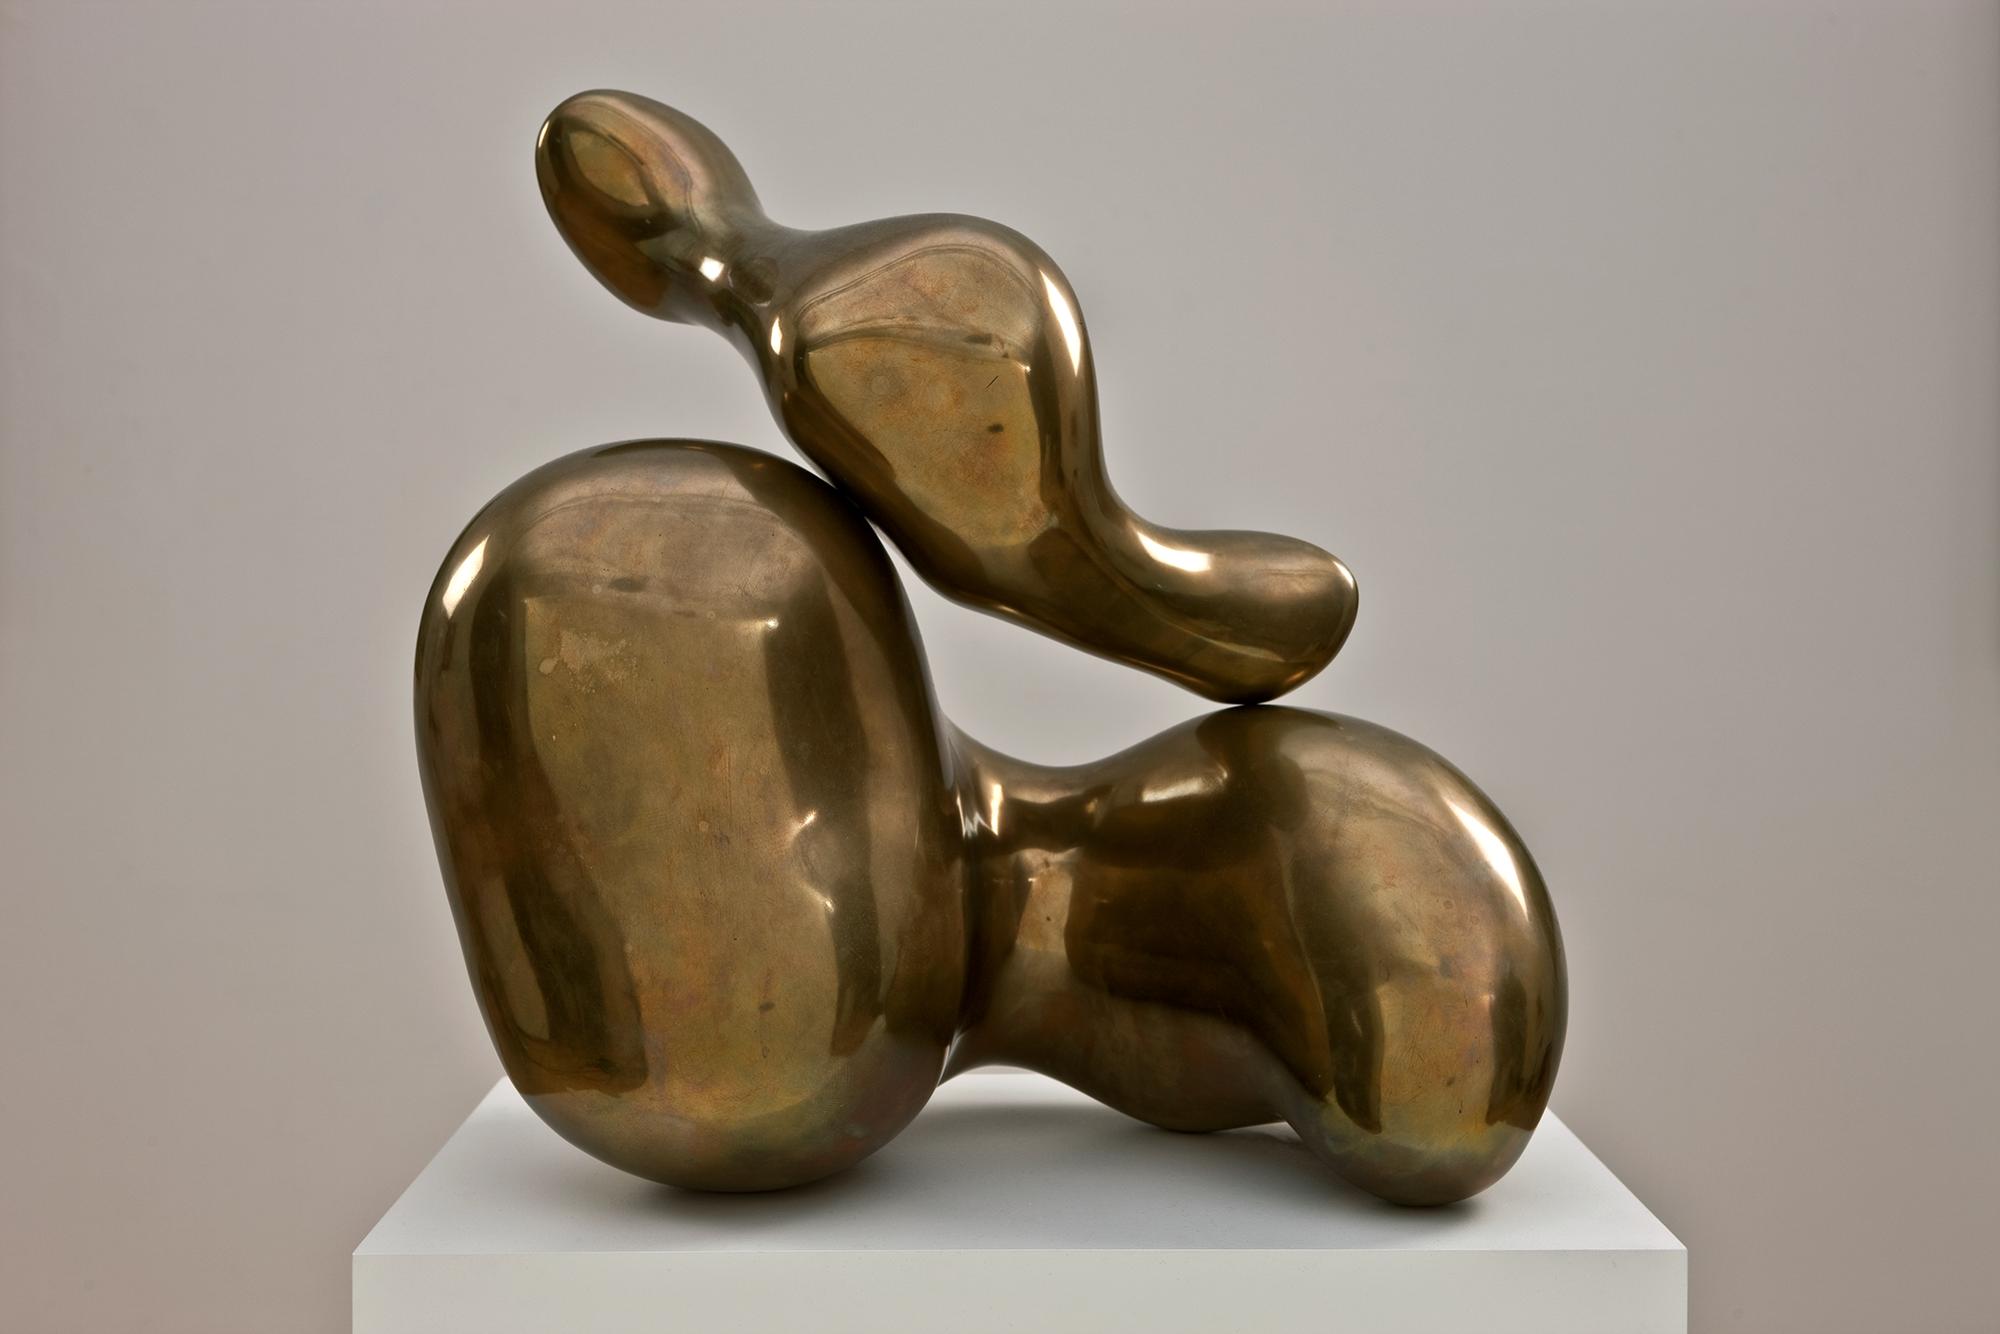 A bronze abstract sculpture, Jean Arp